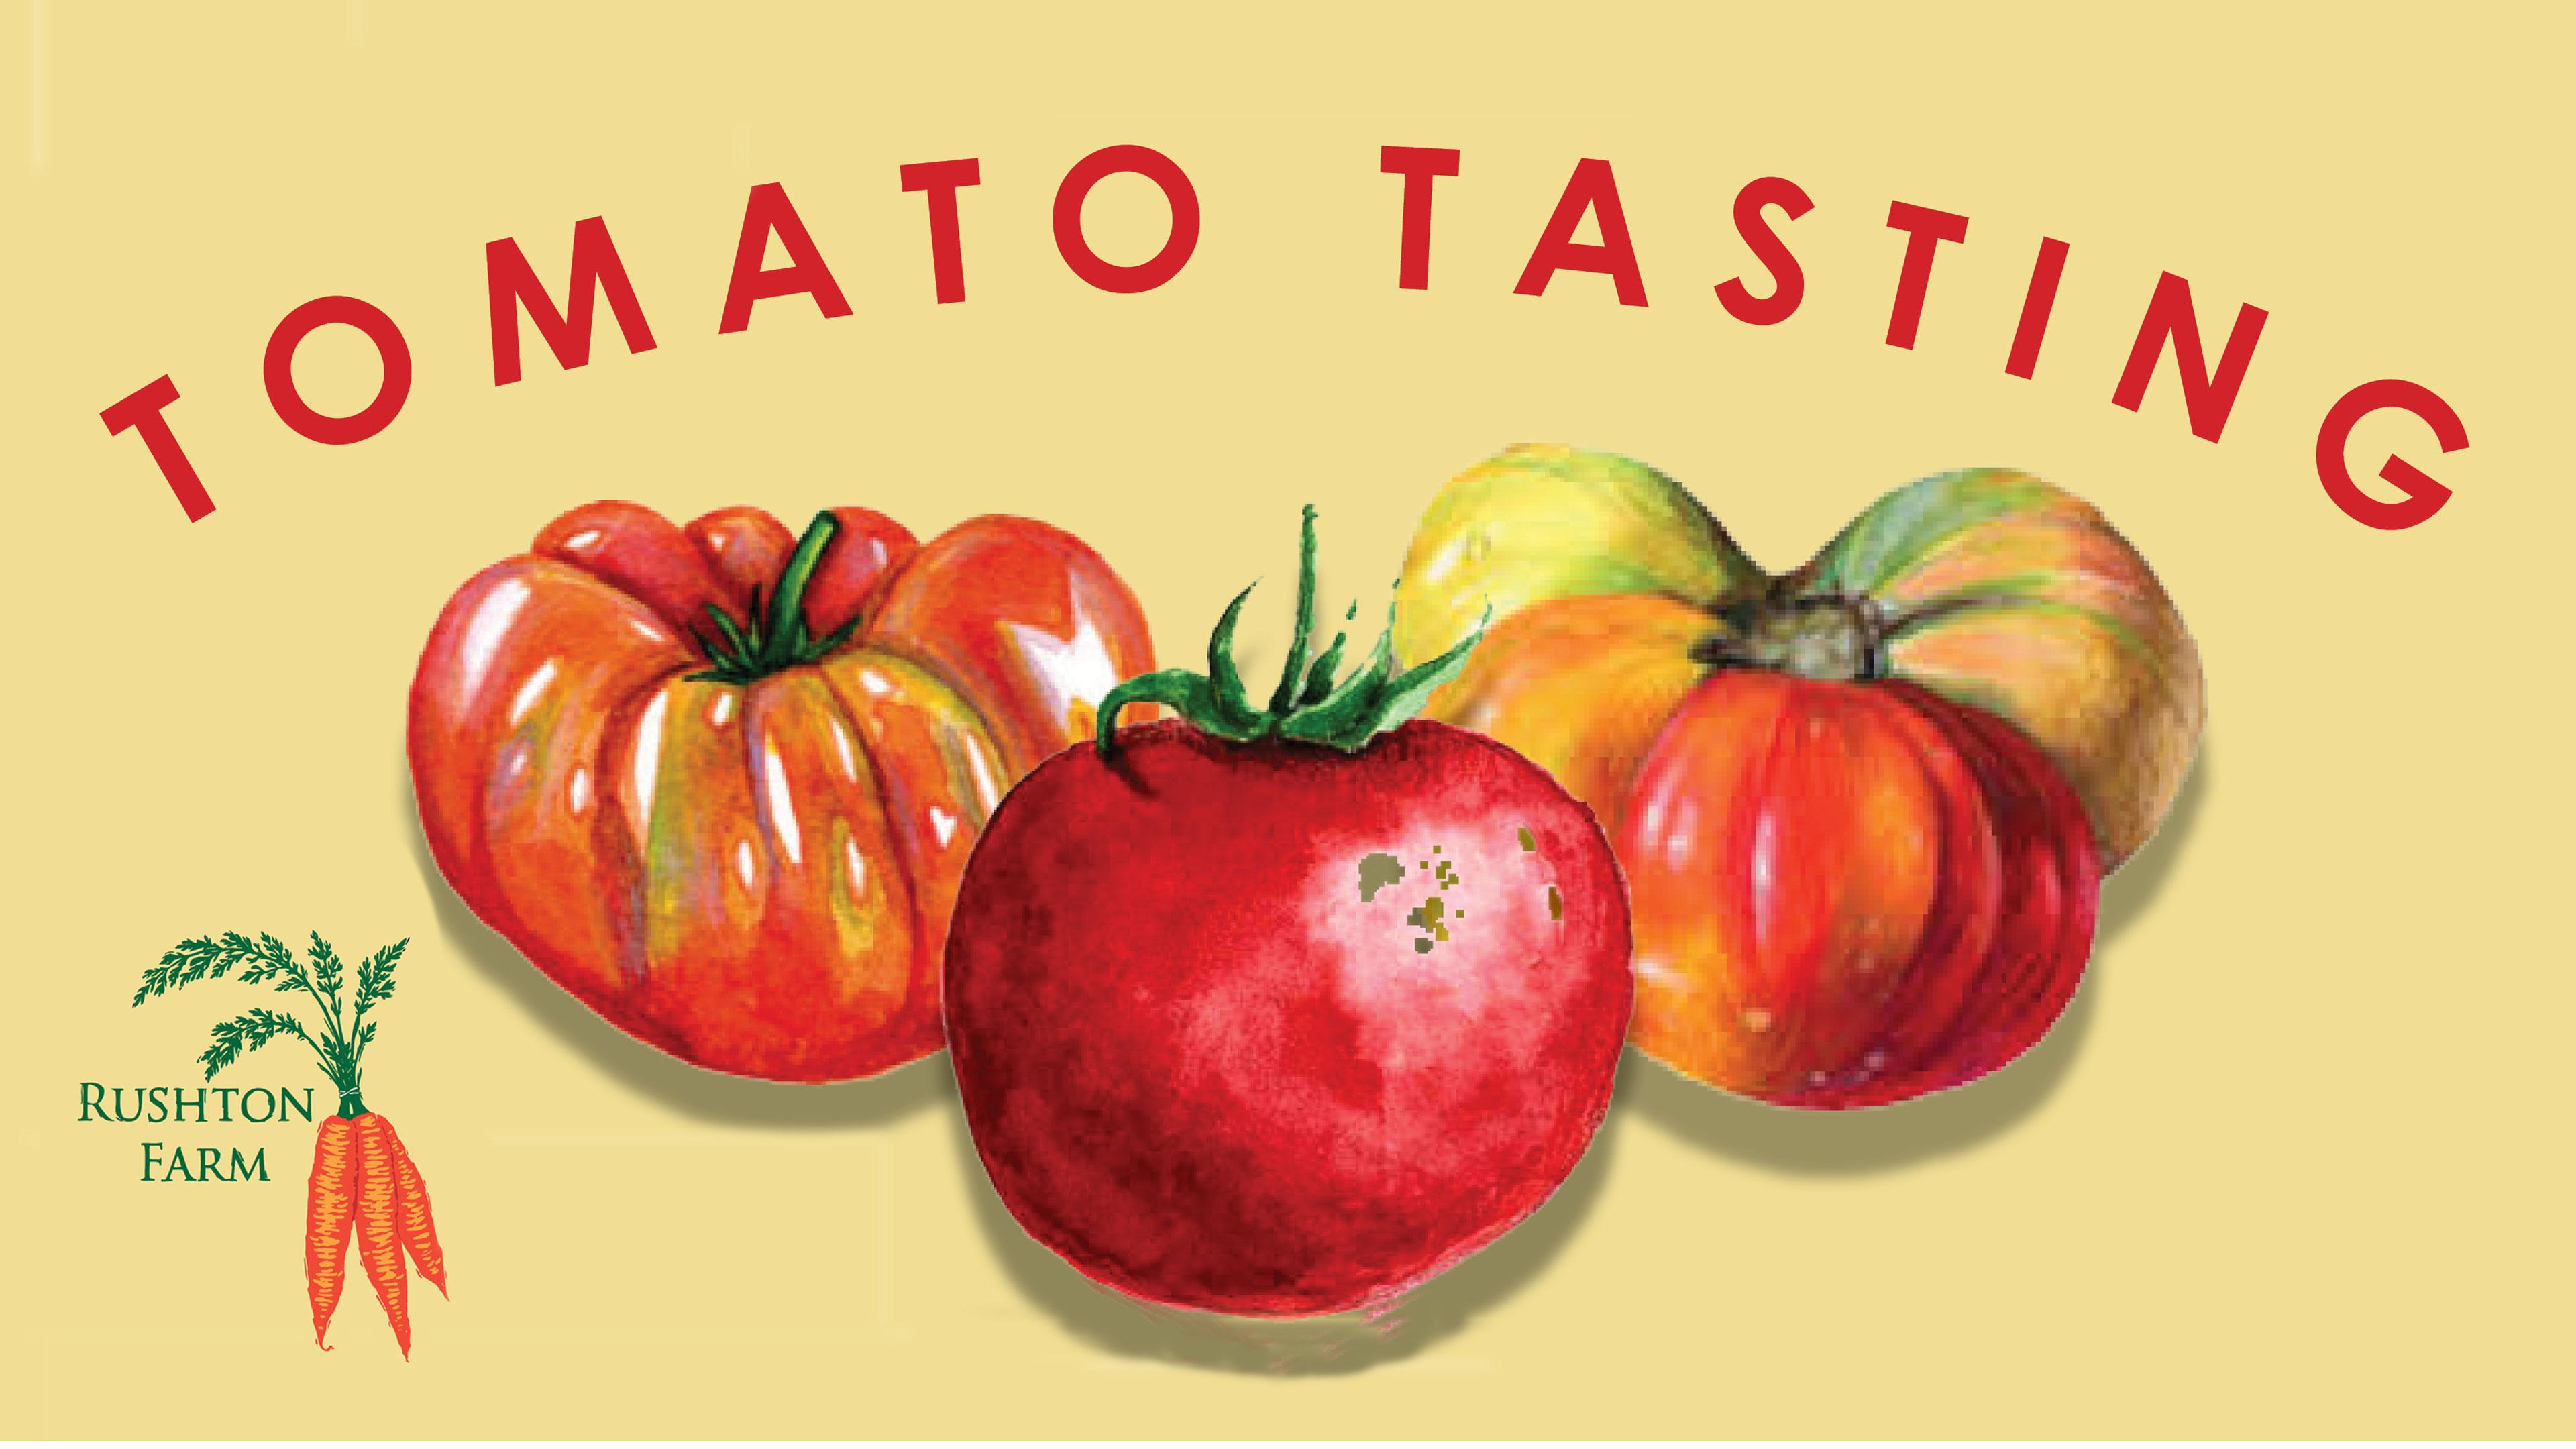 Tomato-Tasting-Panel-for-Web_3840